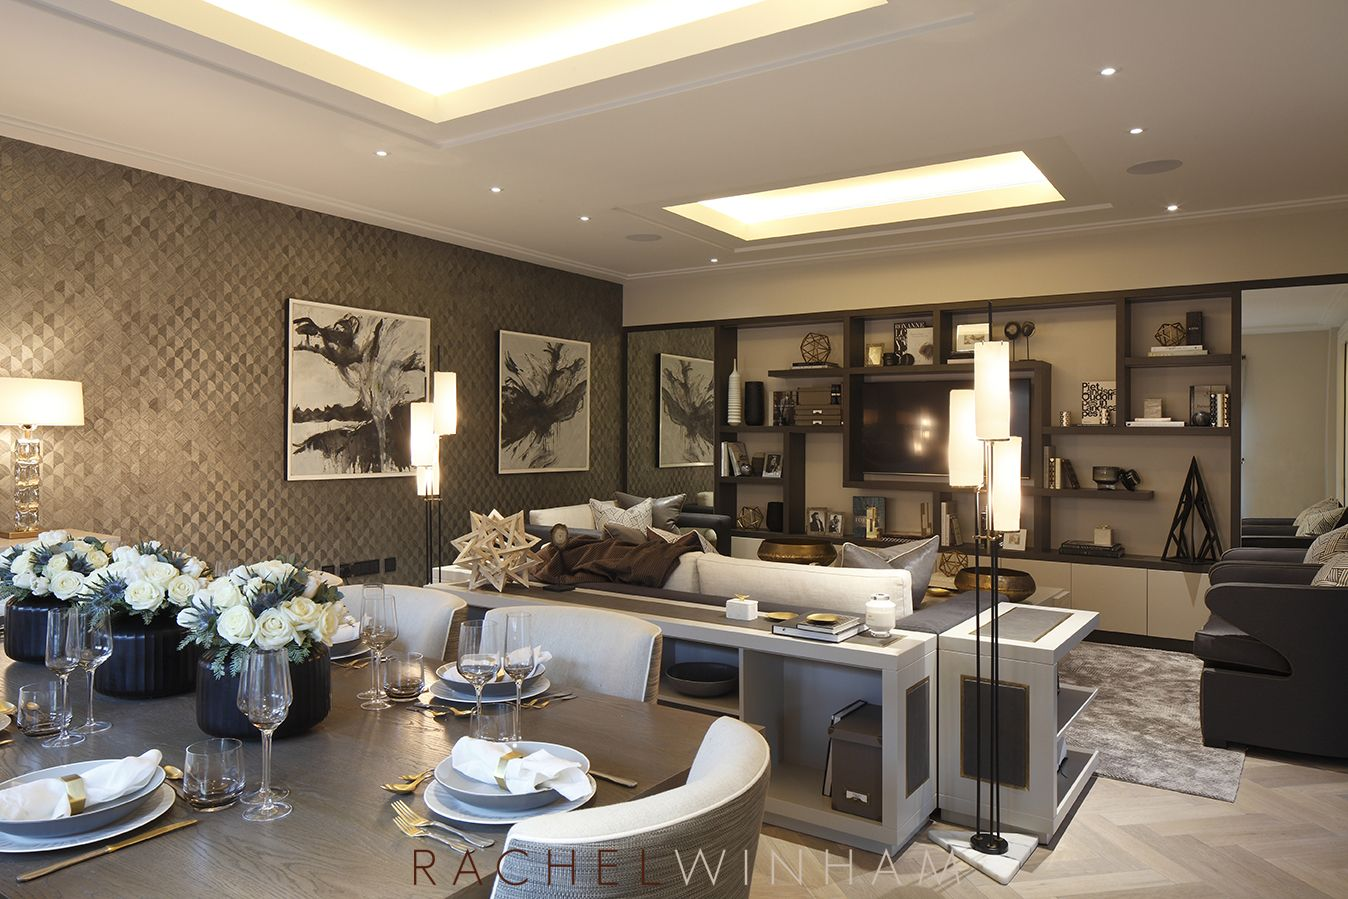 Formal reception room designed by Rachel Winham